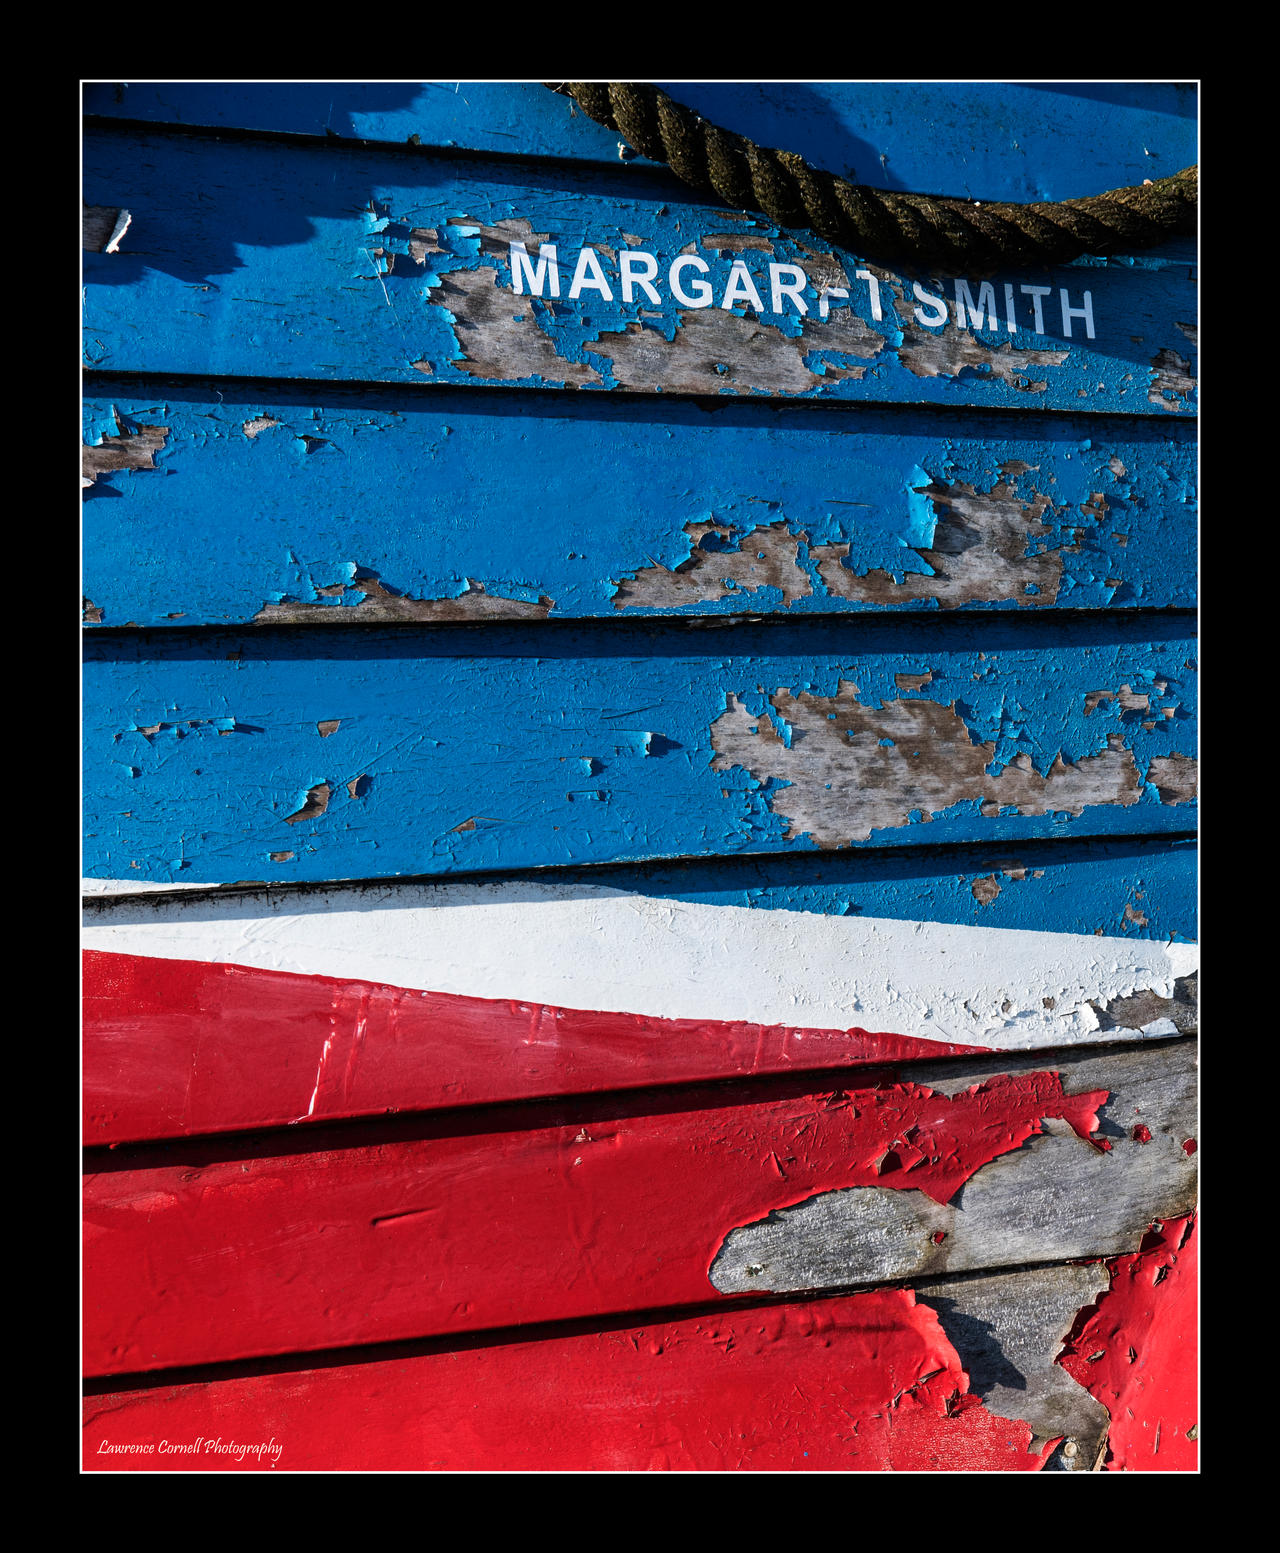 Margaret Smith has seen better days by LordLJCornellPhotos